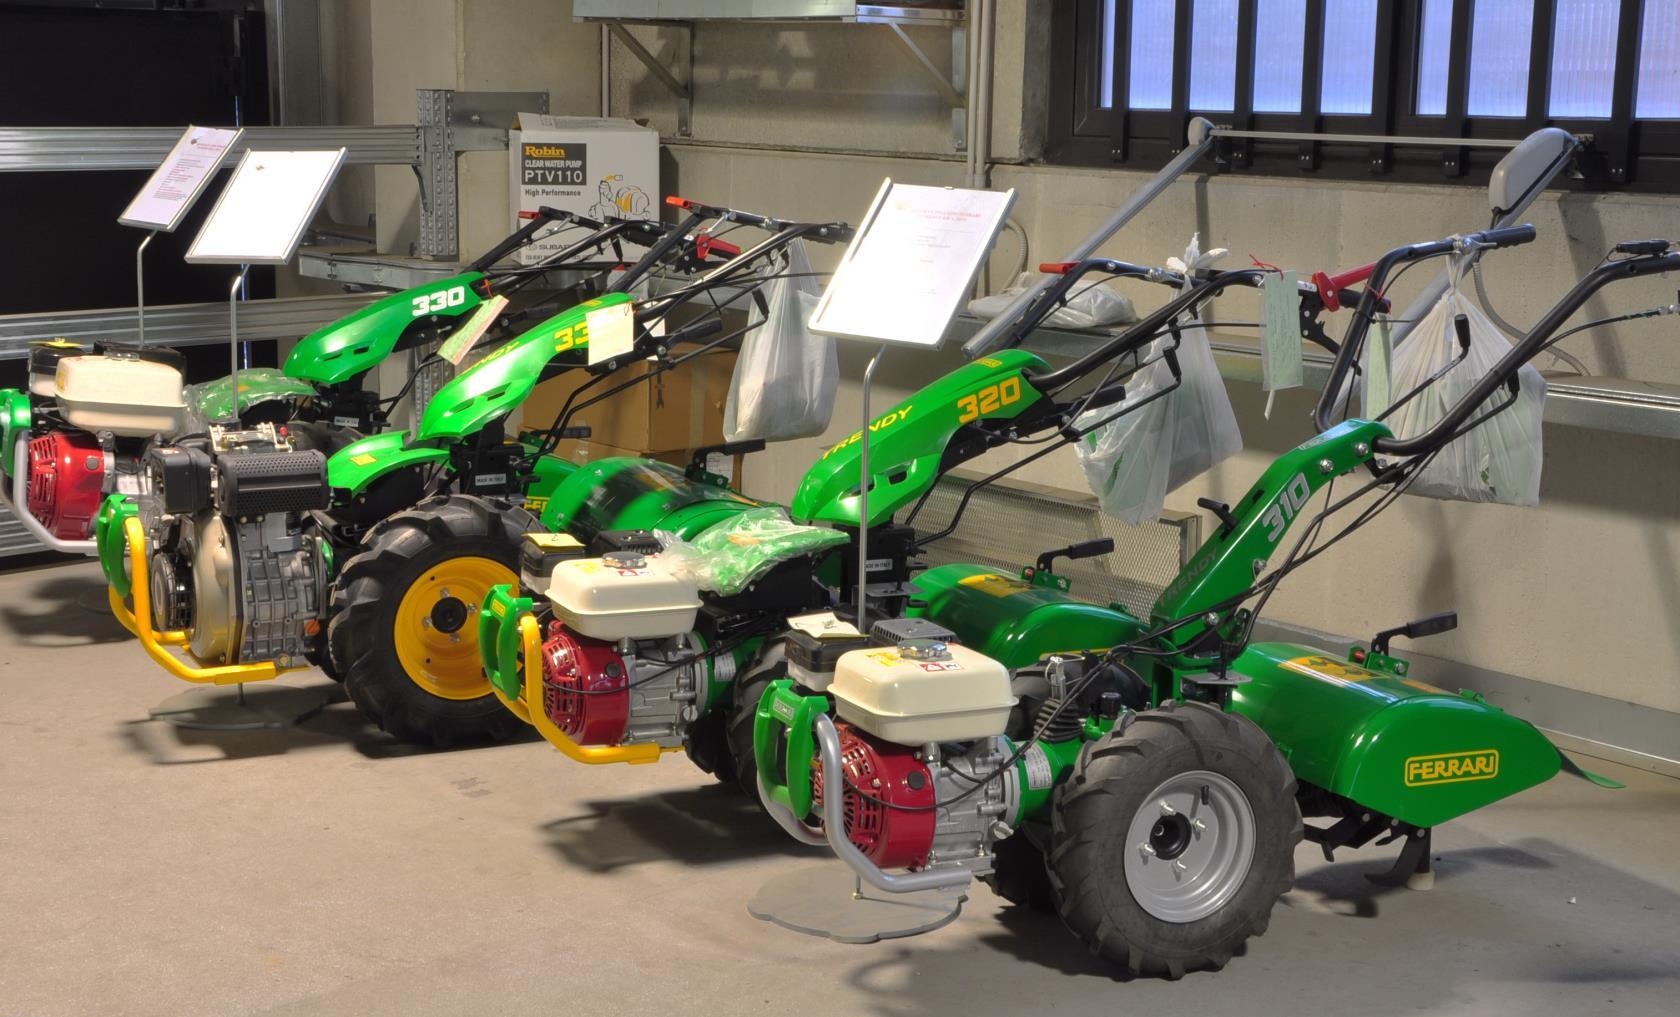 Macchine agricole Rivoli Torino